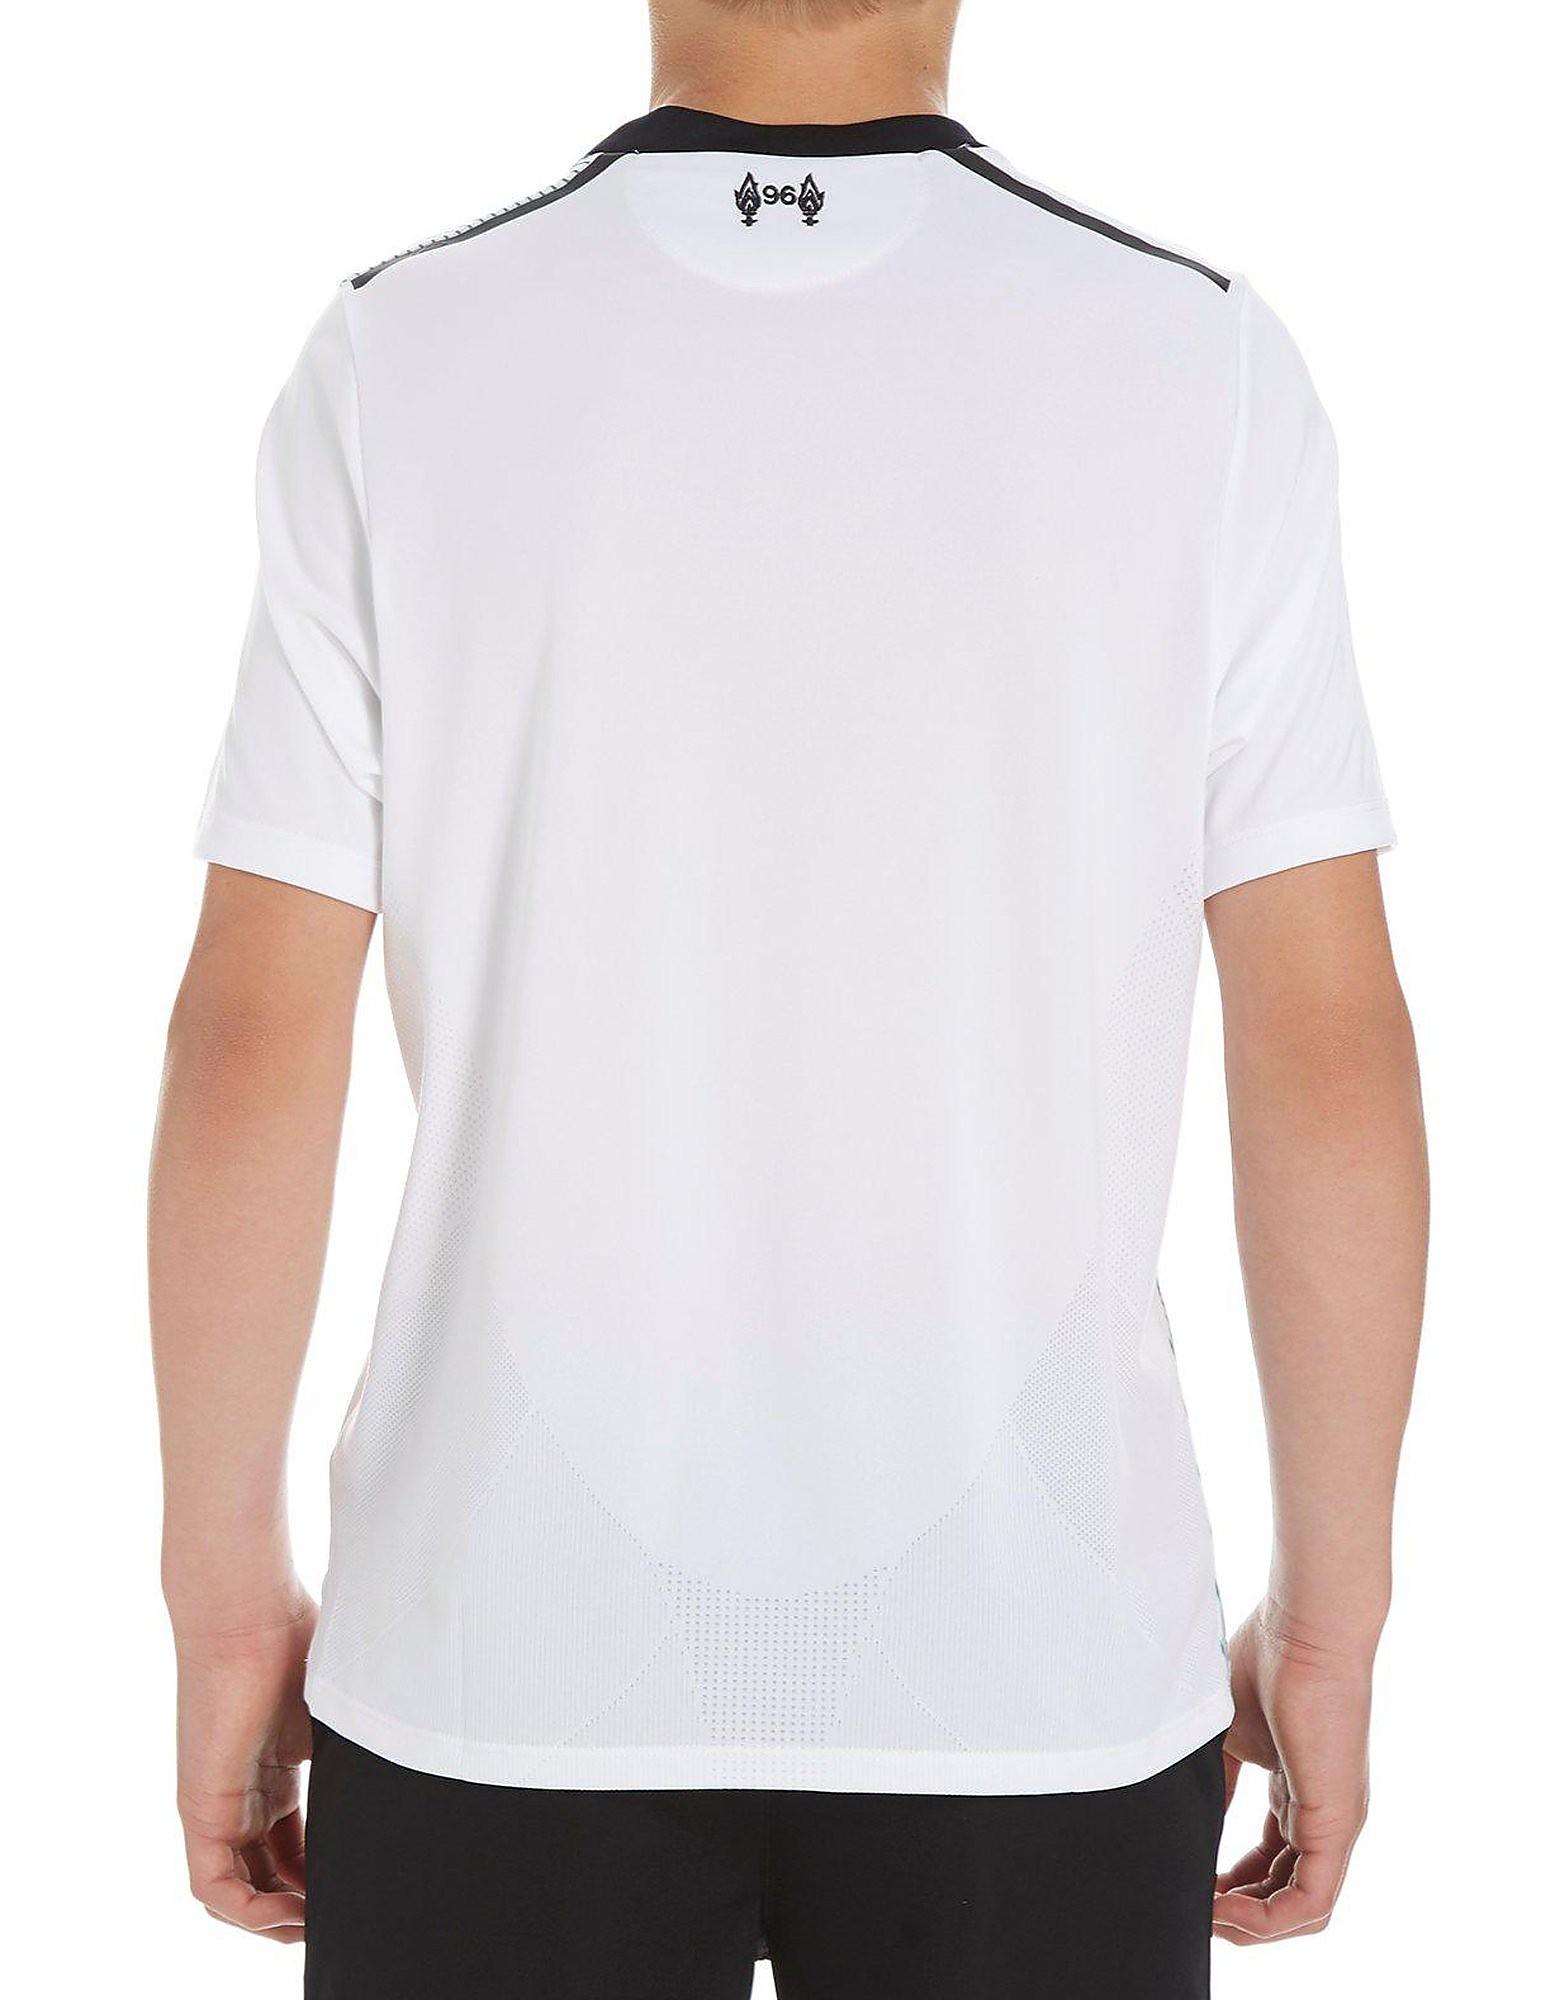 New Balance Liverpool FC 2017/18 Away Shirt Junior